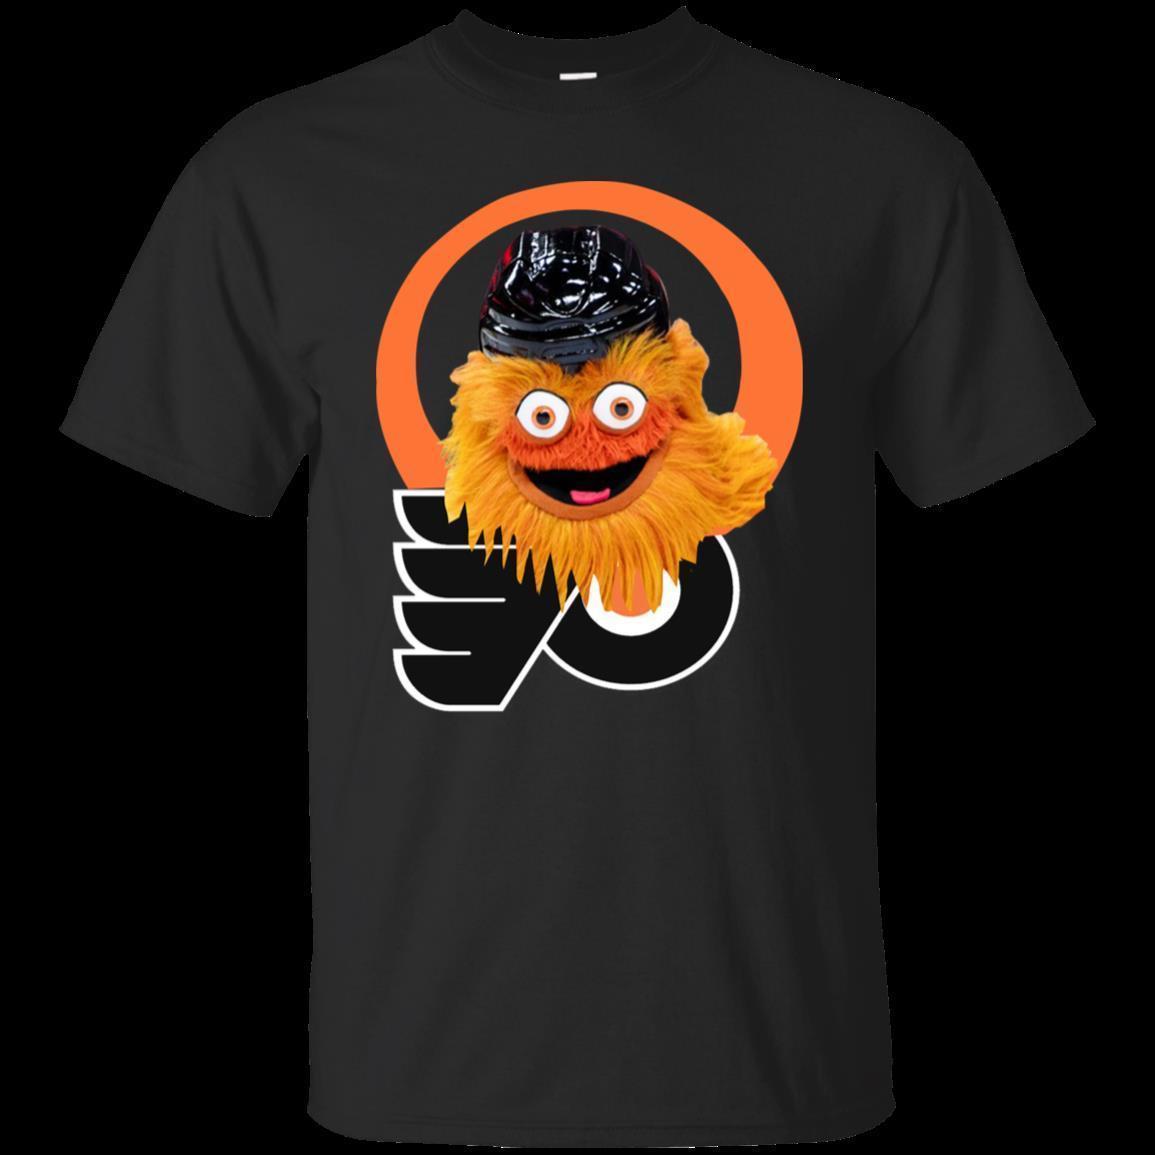 The Head Of Mascot Gritty The Flyers Black T Shirt Men Women S 6XL Men  Women Unisex Fashion Tshirt Shirt Site Printing Of T Shirt From  Designprinttshirts04 6c8d3d074